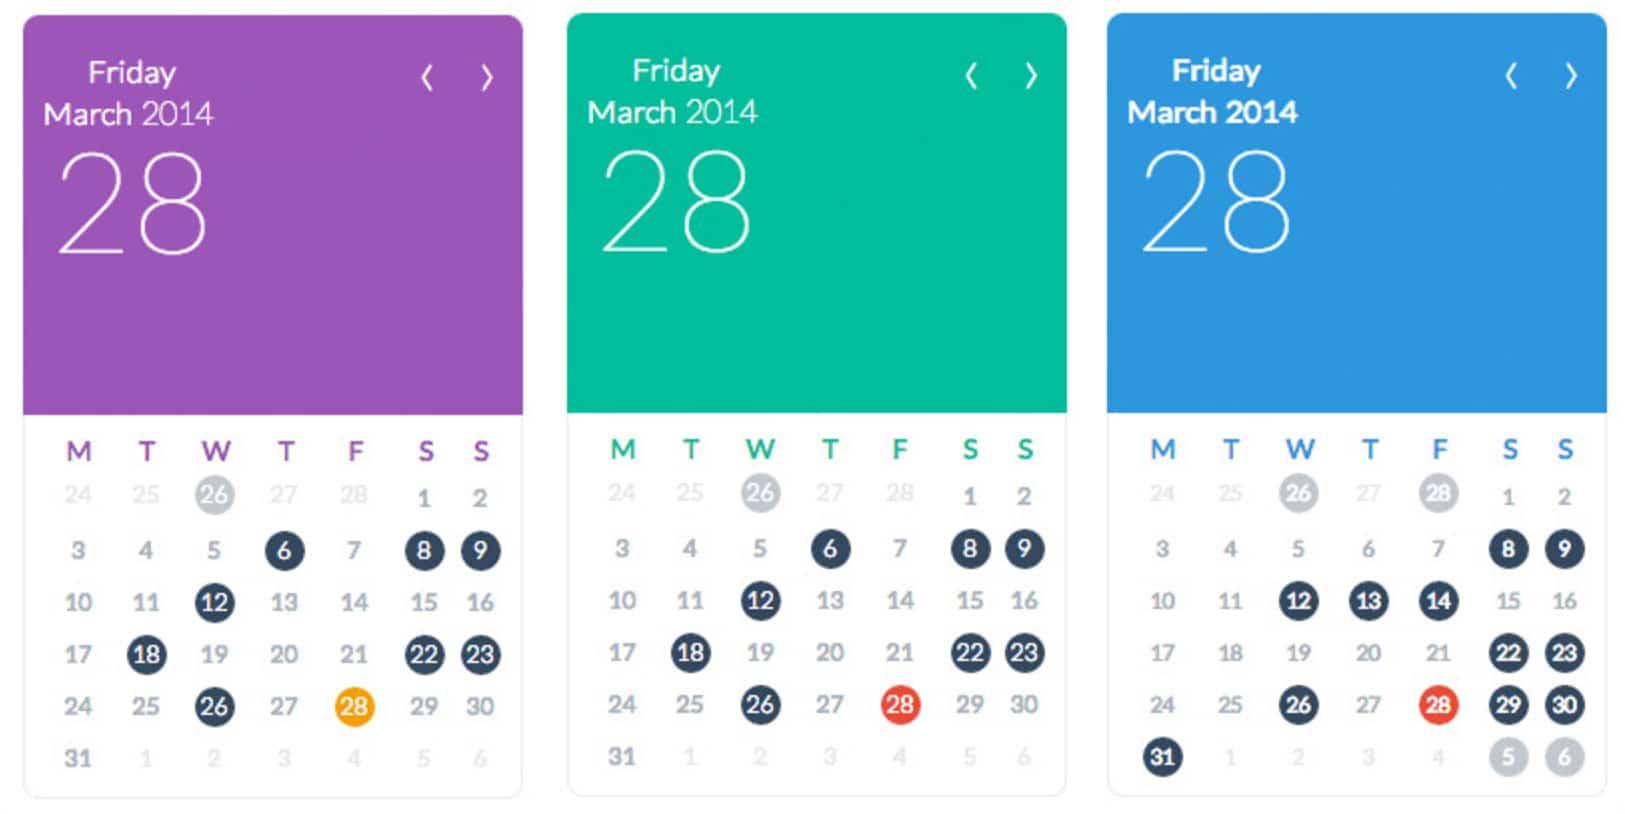 WordPress events calendar